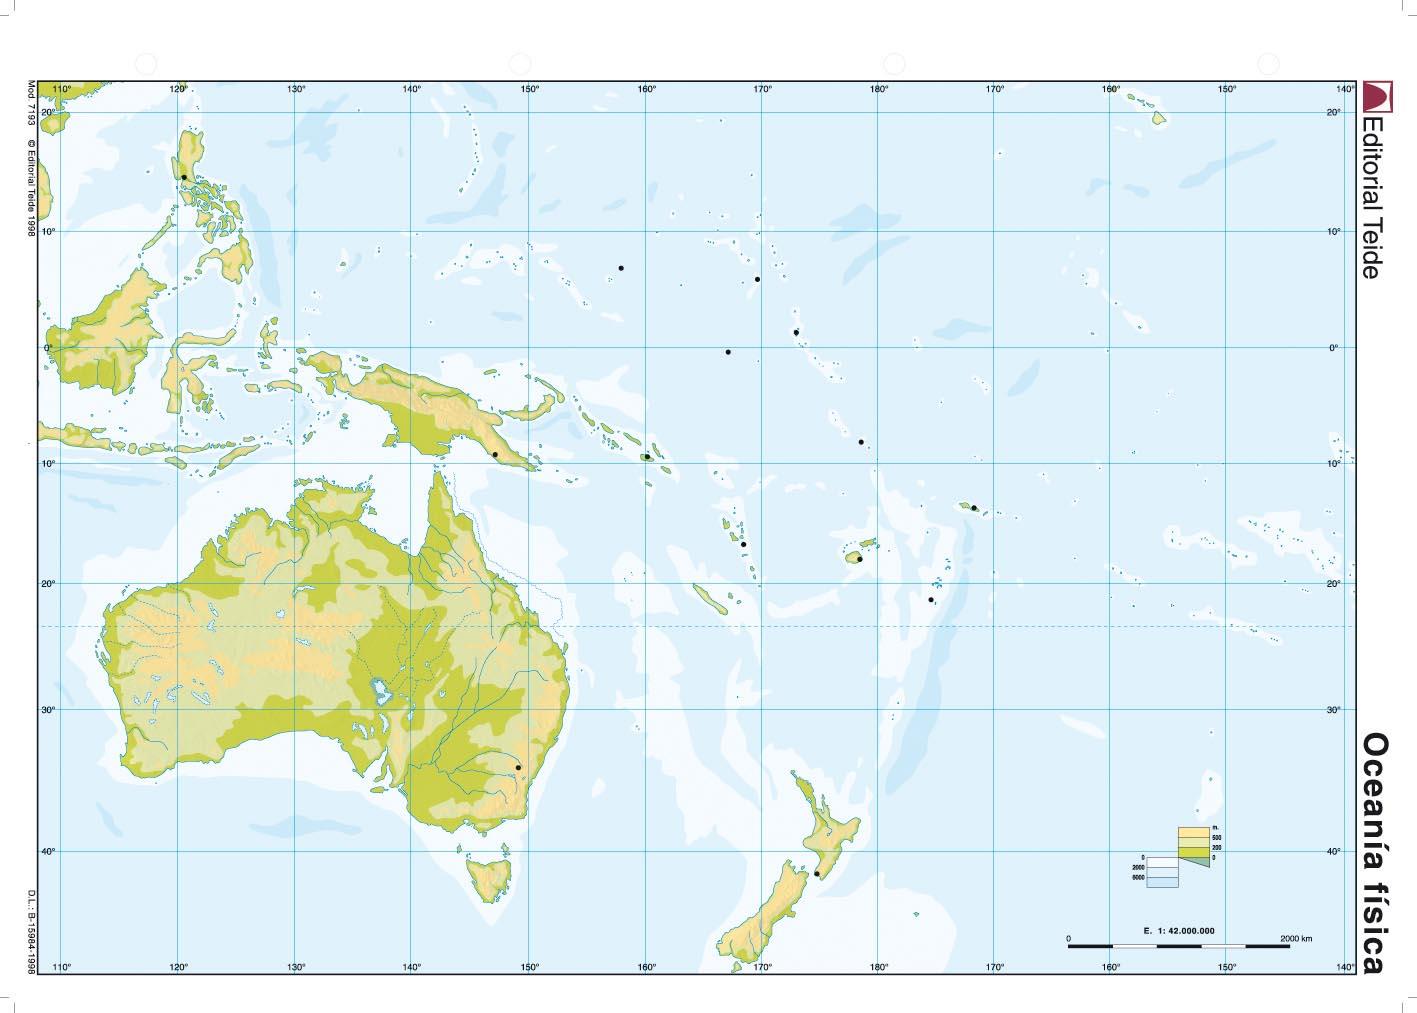 El blog de Sociales Mapa fsico Oceana